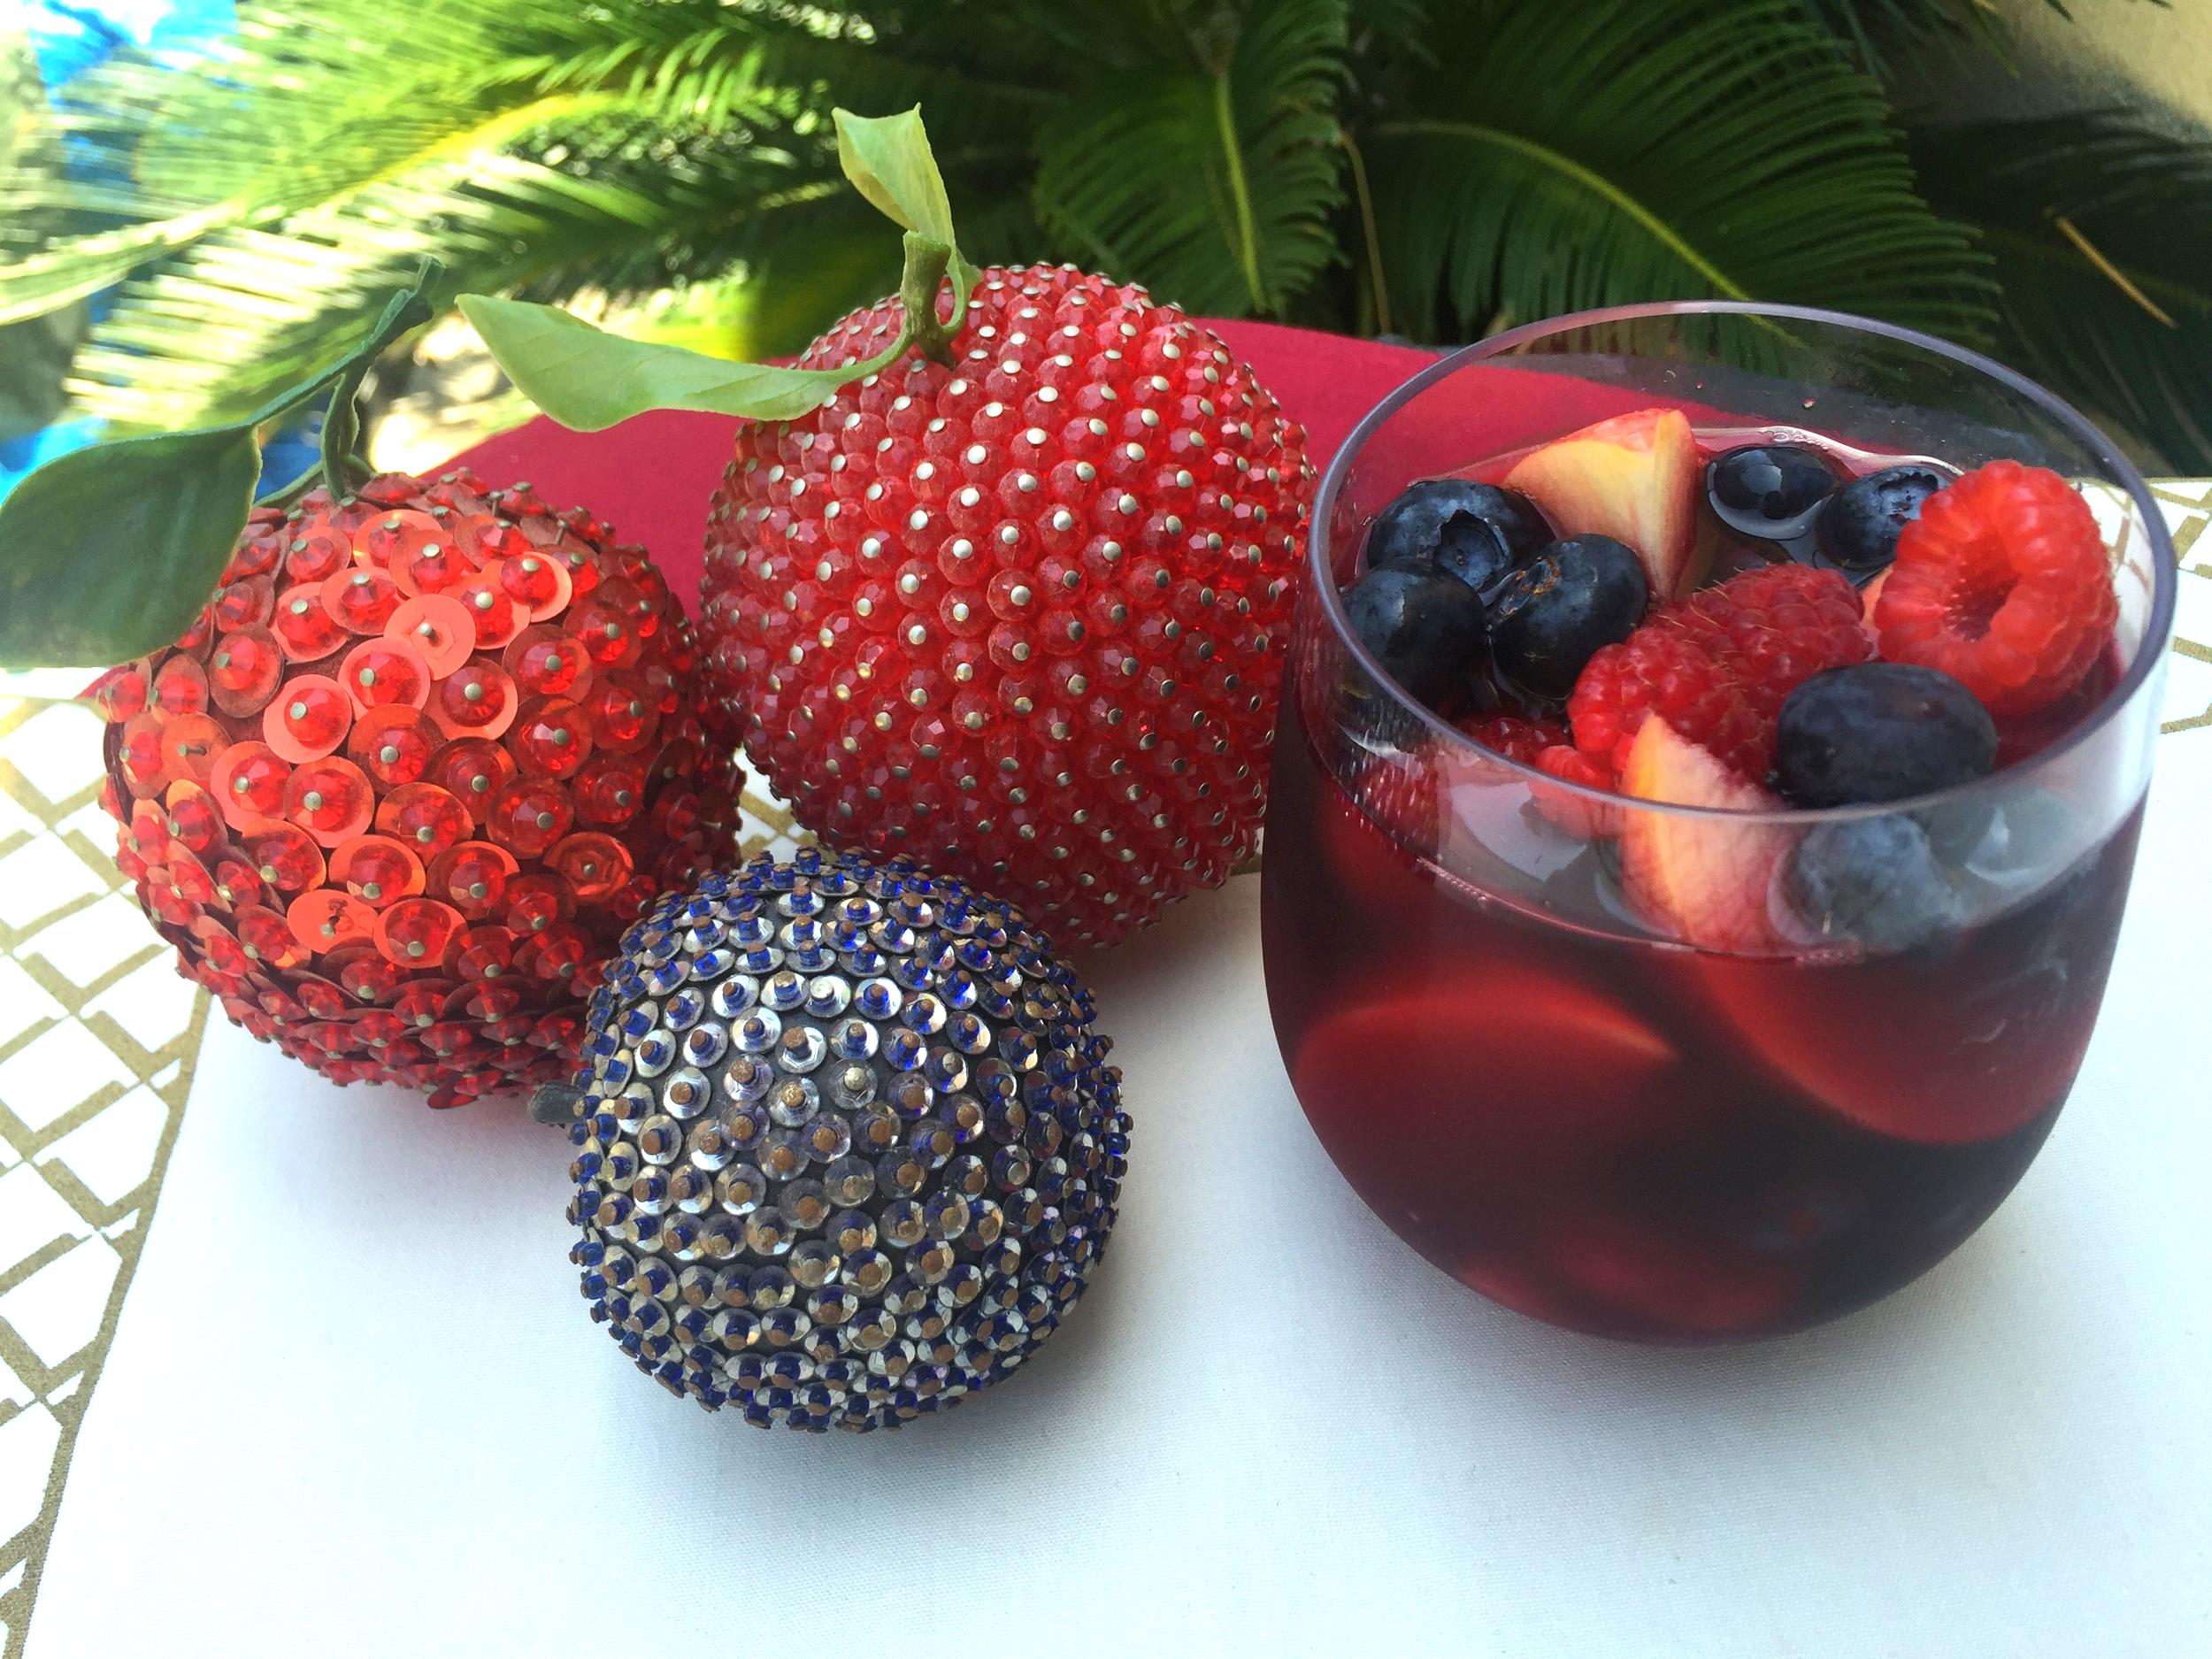 Red, White & Blue Sangria with Christina Milian's Viva Diva Wine